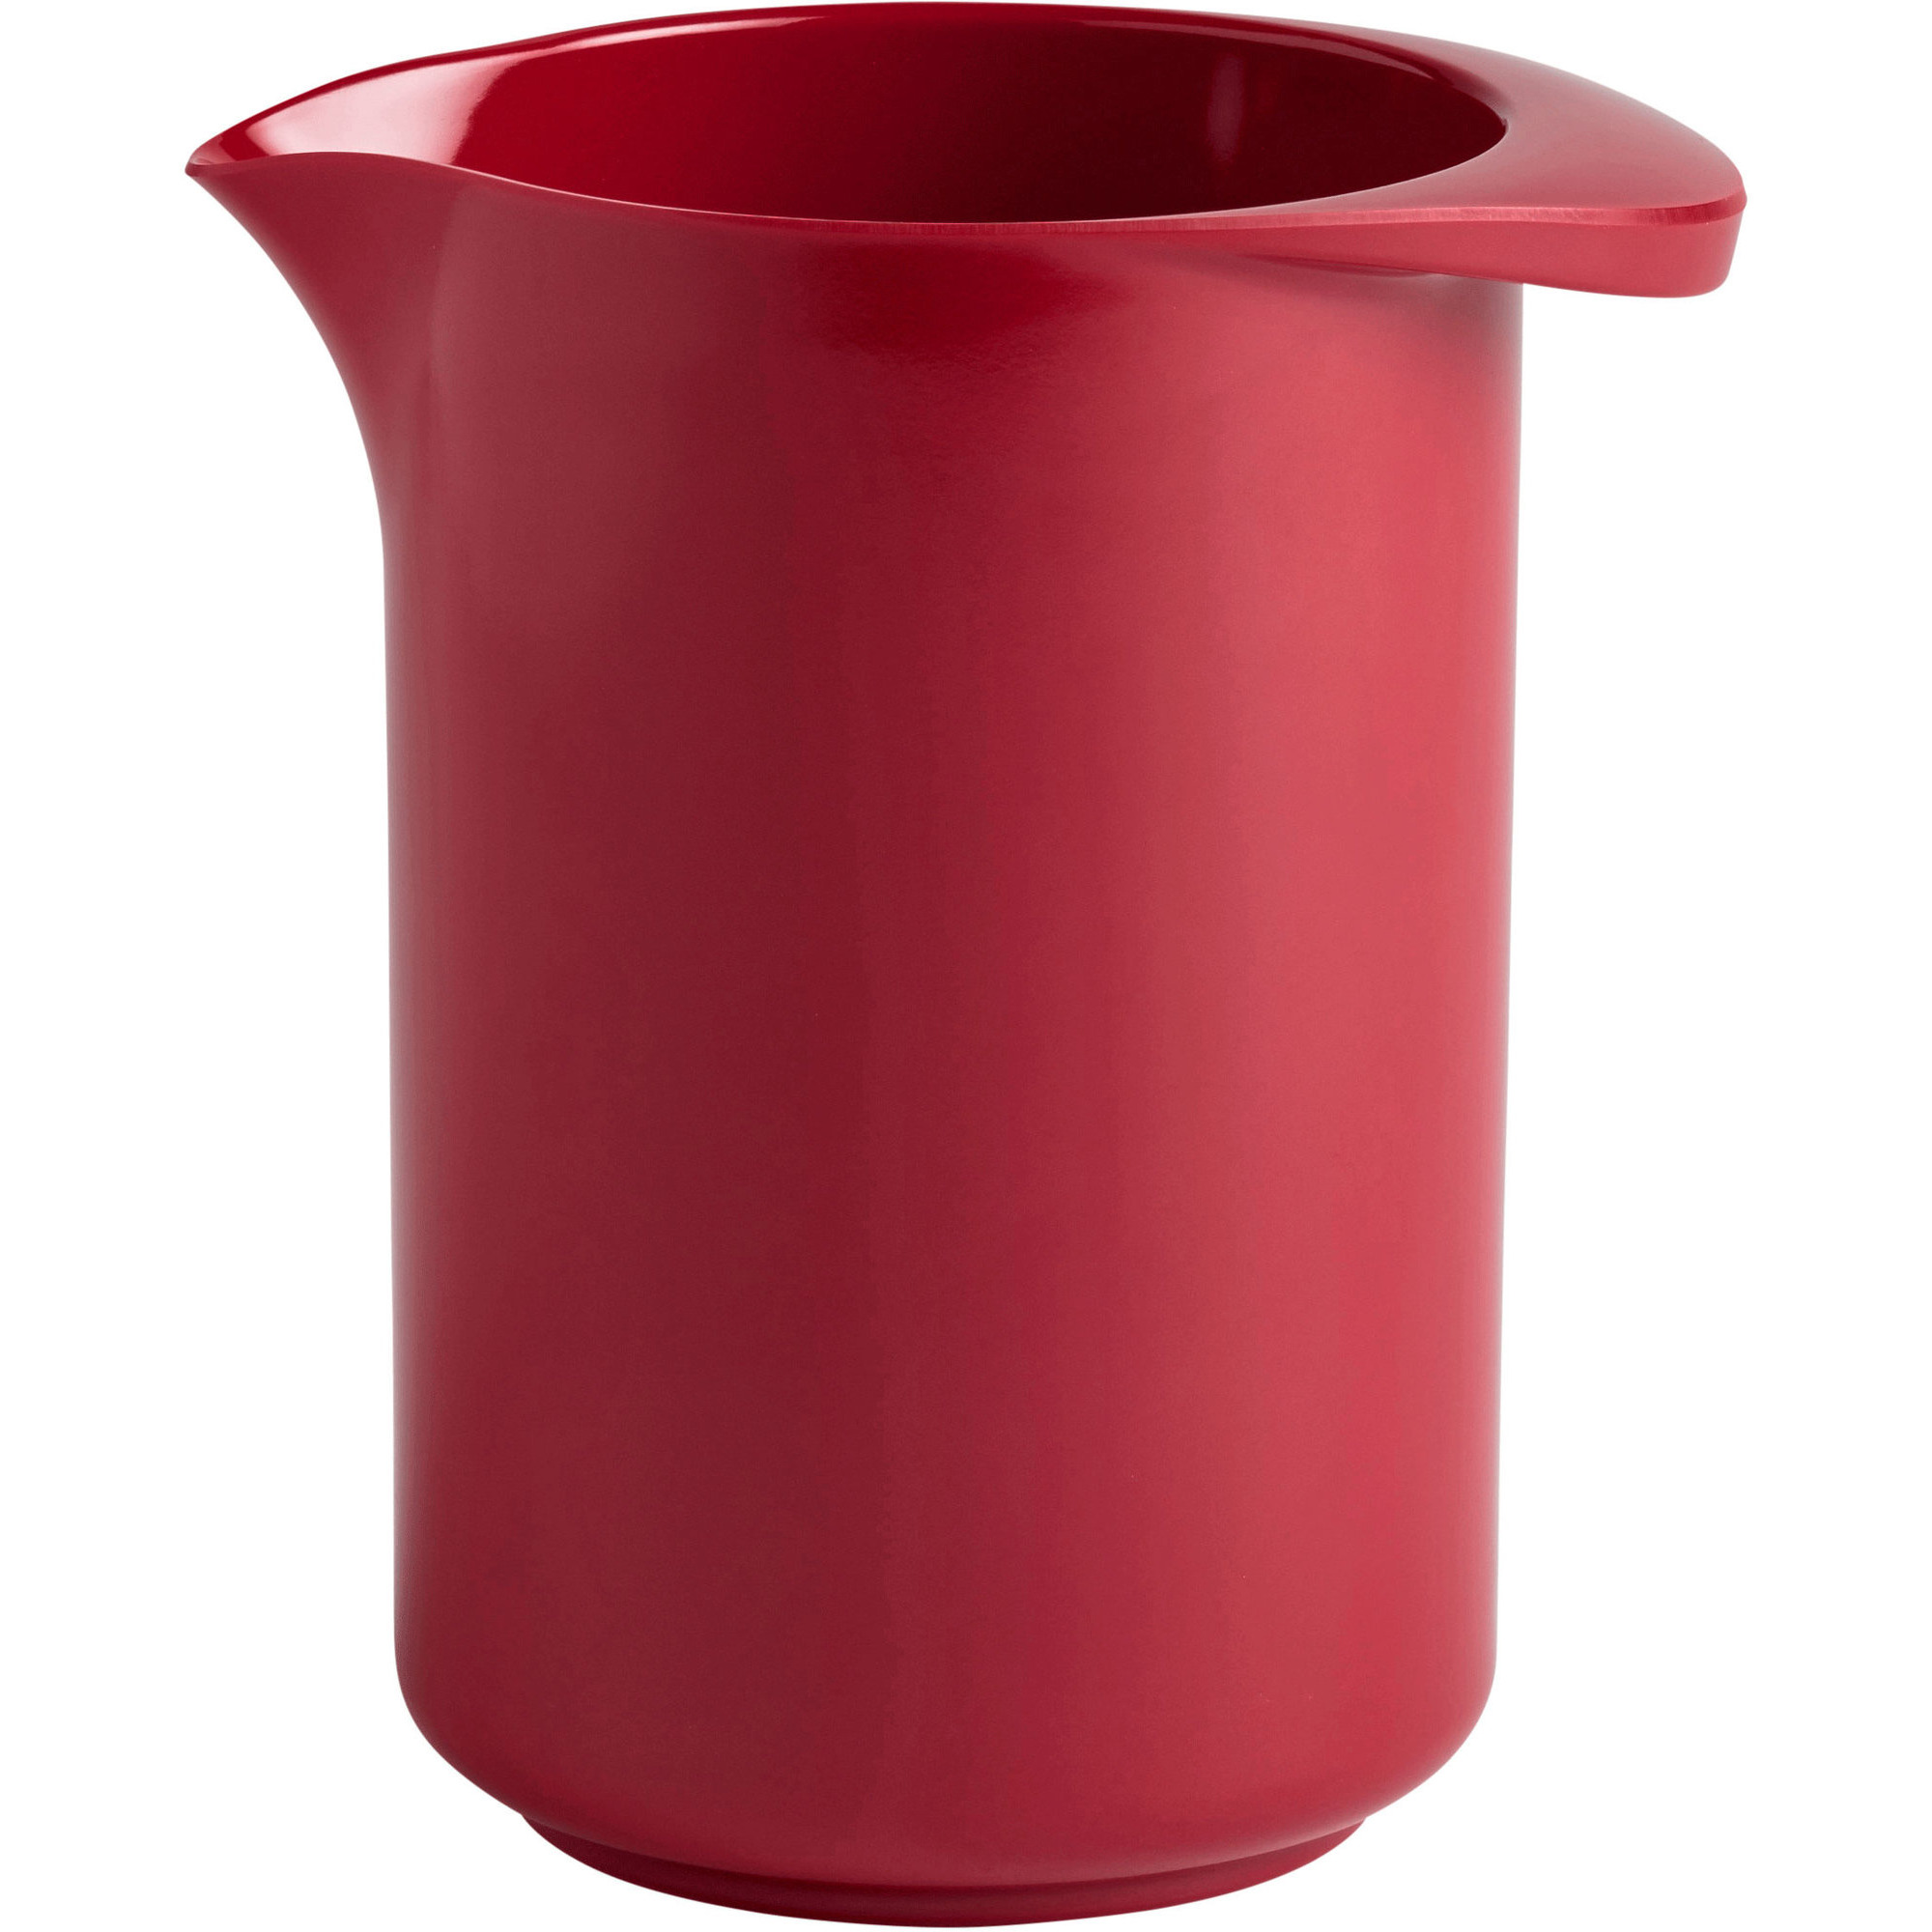 Rosti Mepal mixkanna 05 liter (Röd)